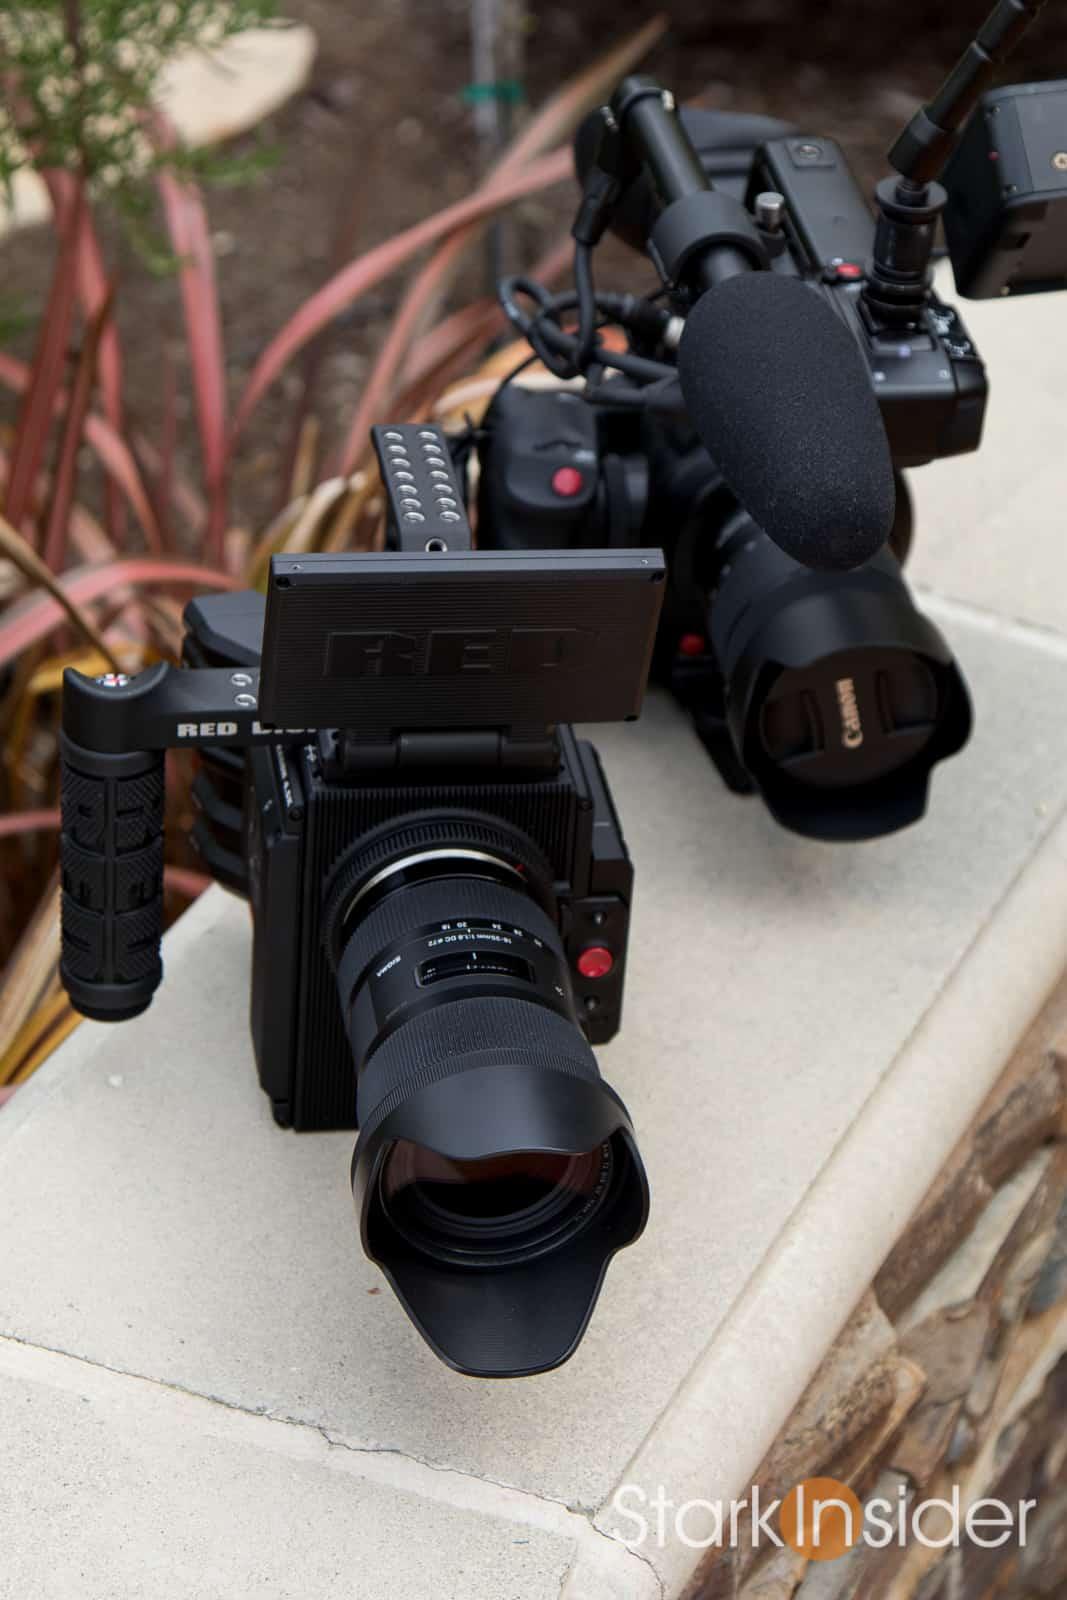 RED-Raven-Camera-Unboxing-Stark-Insider-8739